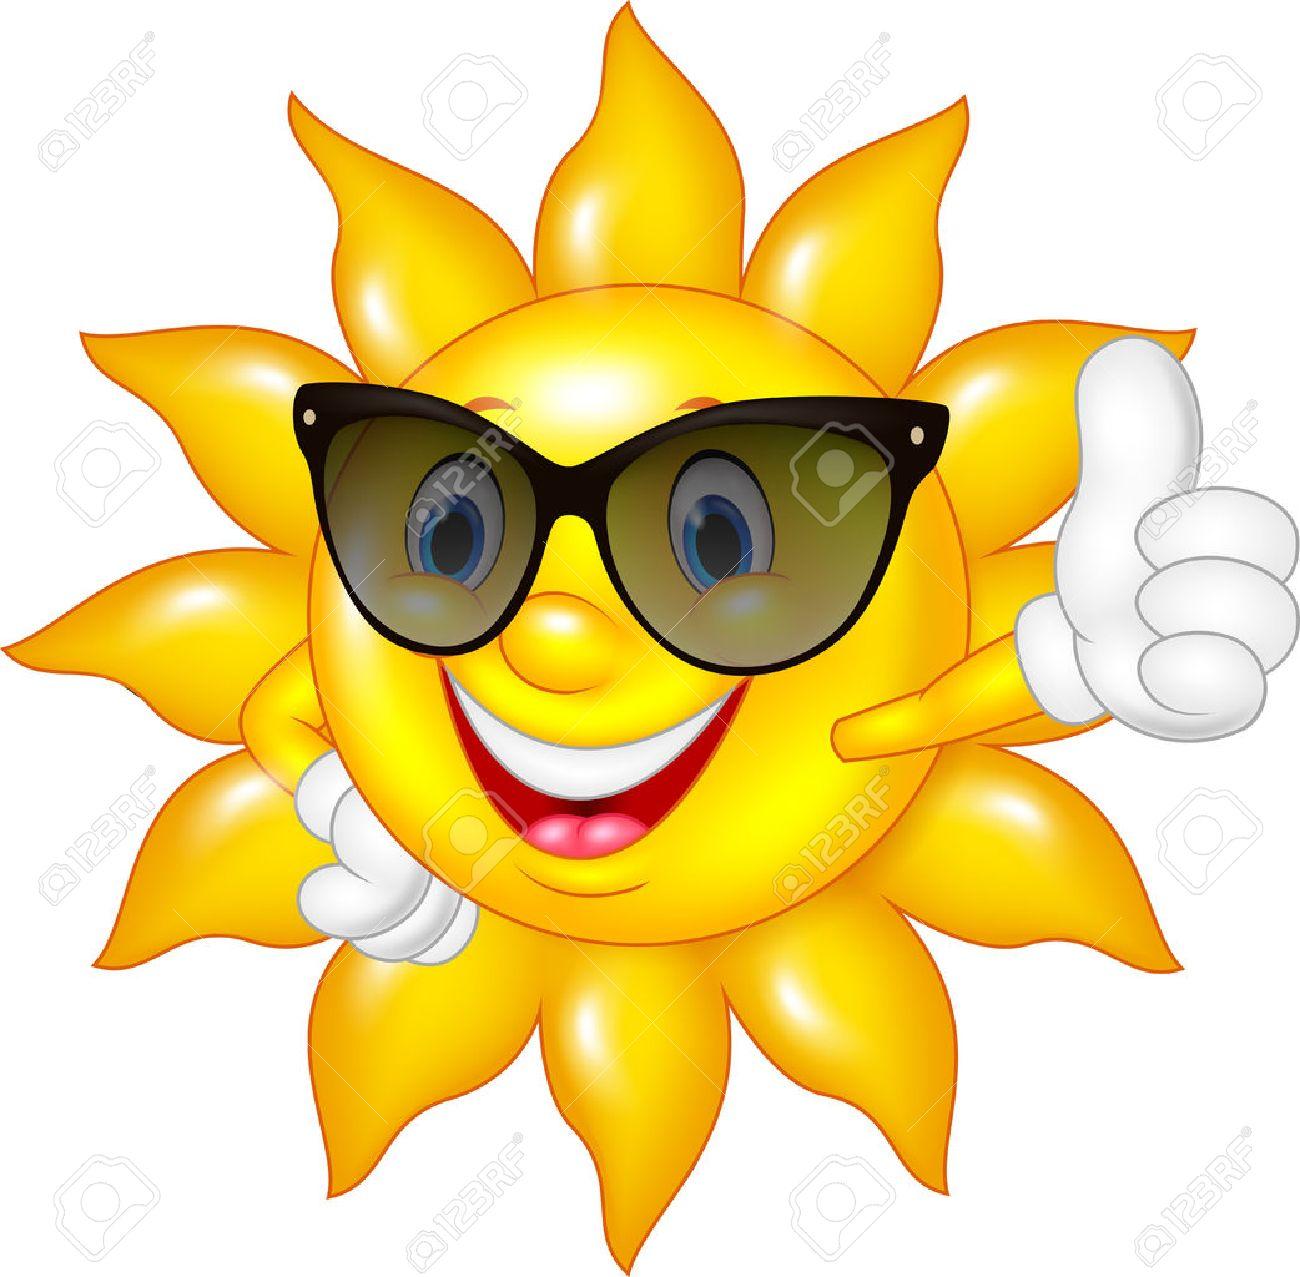 e00f3412b4 Arriba Ilustración Que Sol Da De Los Pulgares Para Vectorial dCshQtr